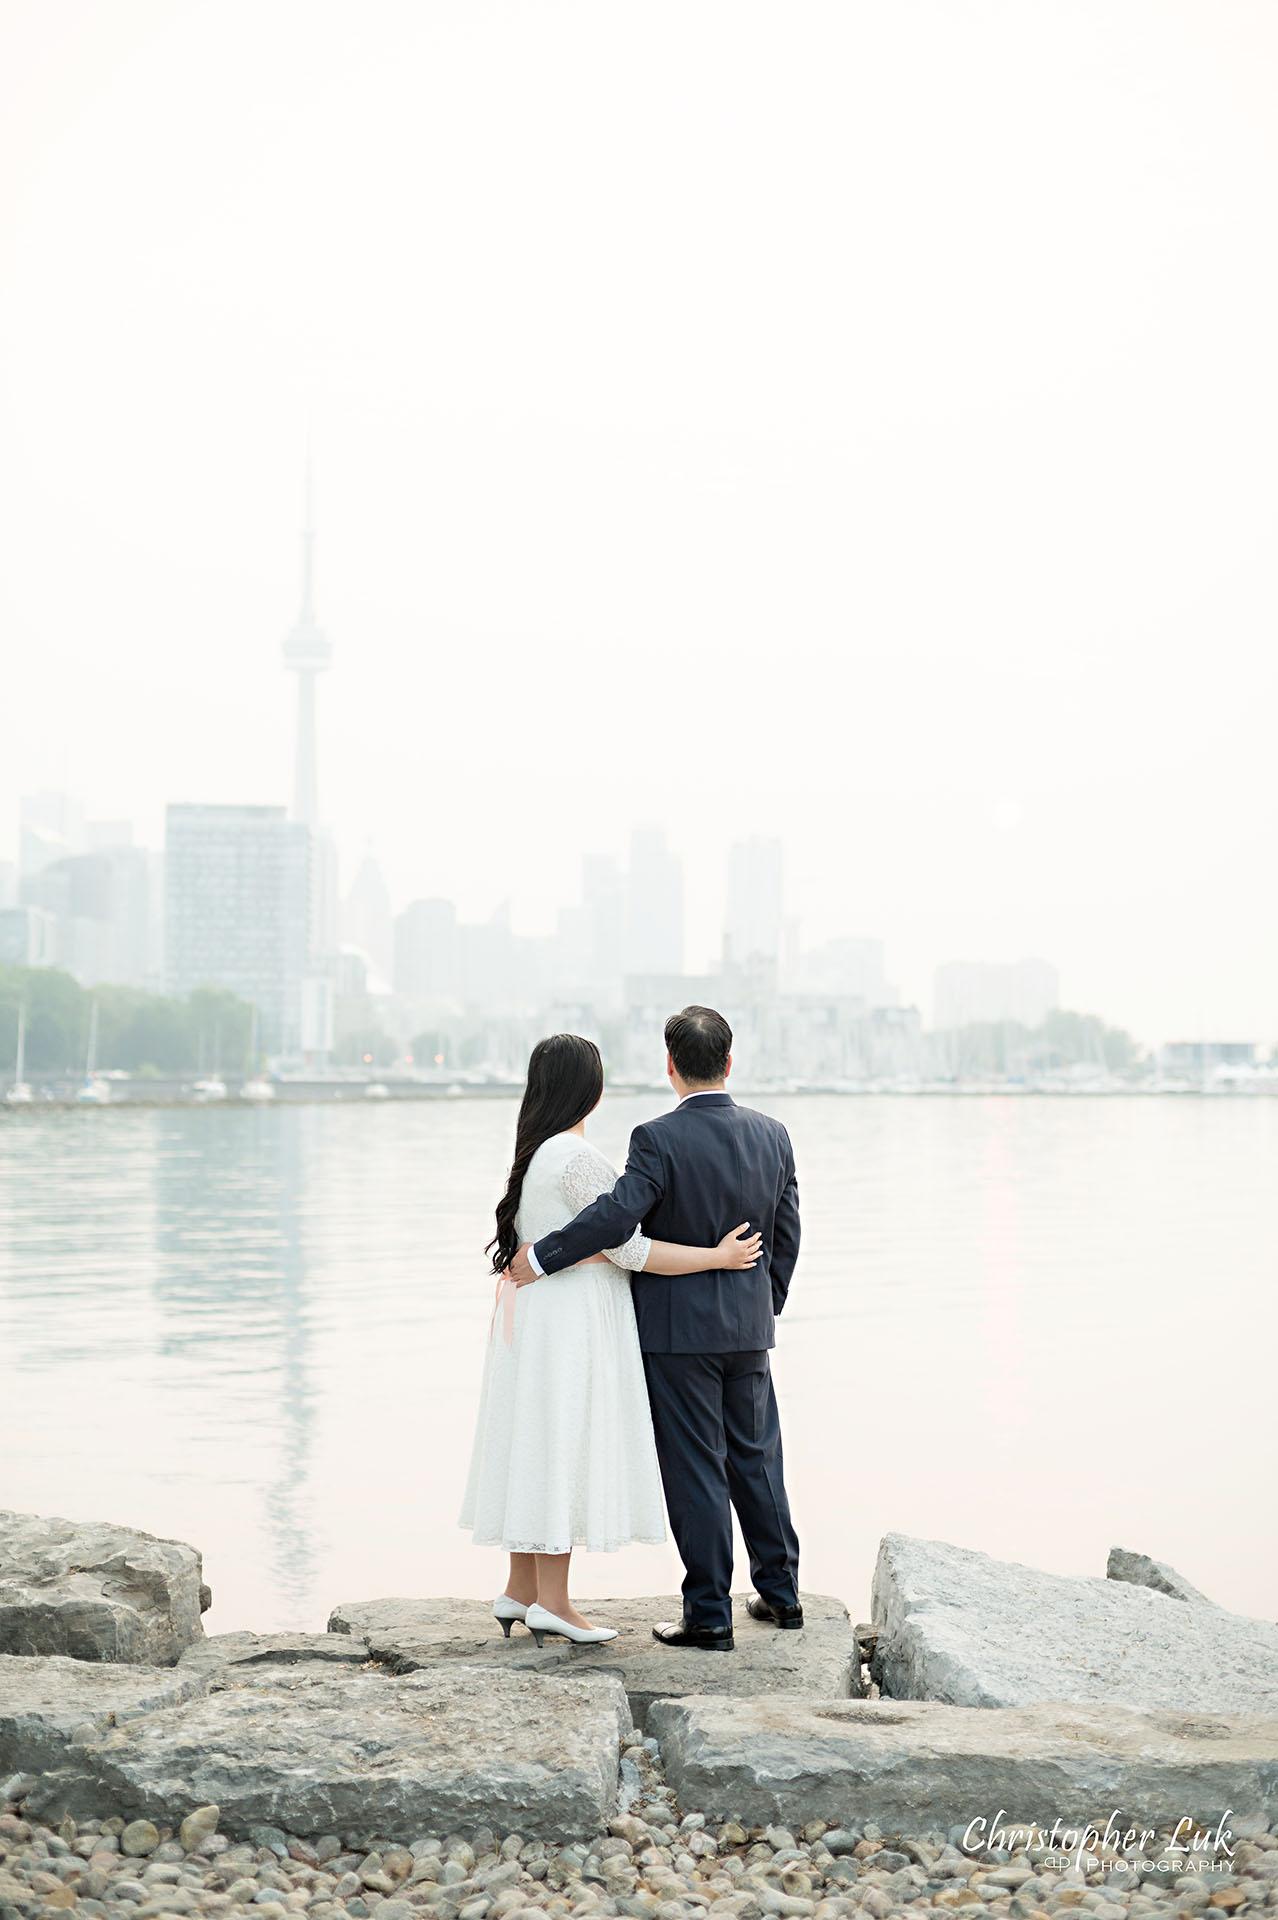 Christopher Luk Toronto Wedding Photographer Trillium Park Engagement Session Ontario Place Waterfront Skyline Natural Candid Photojournalistic Bride Groom Hug Together Loving CN Tower Portrait